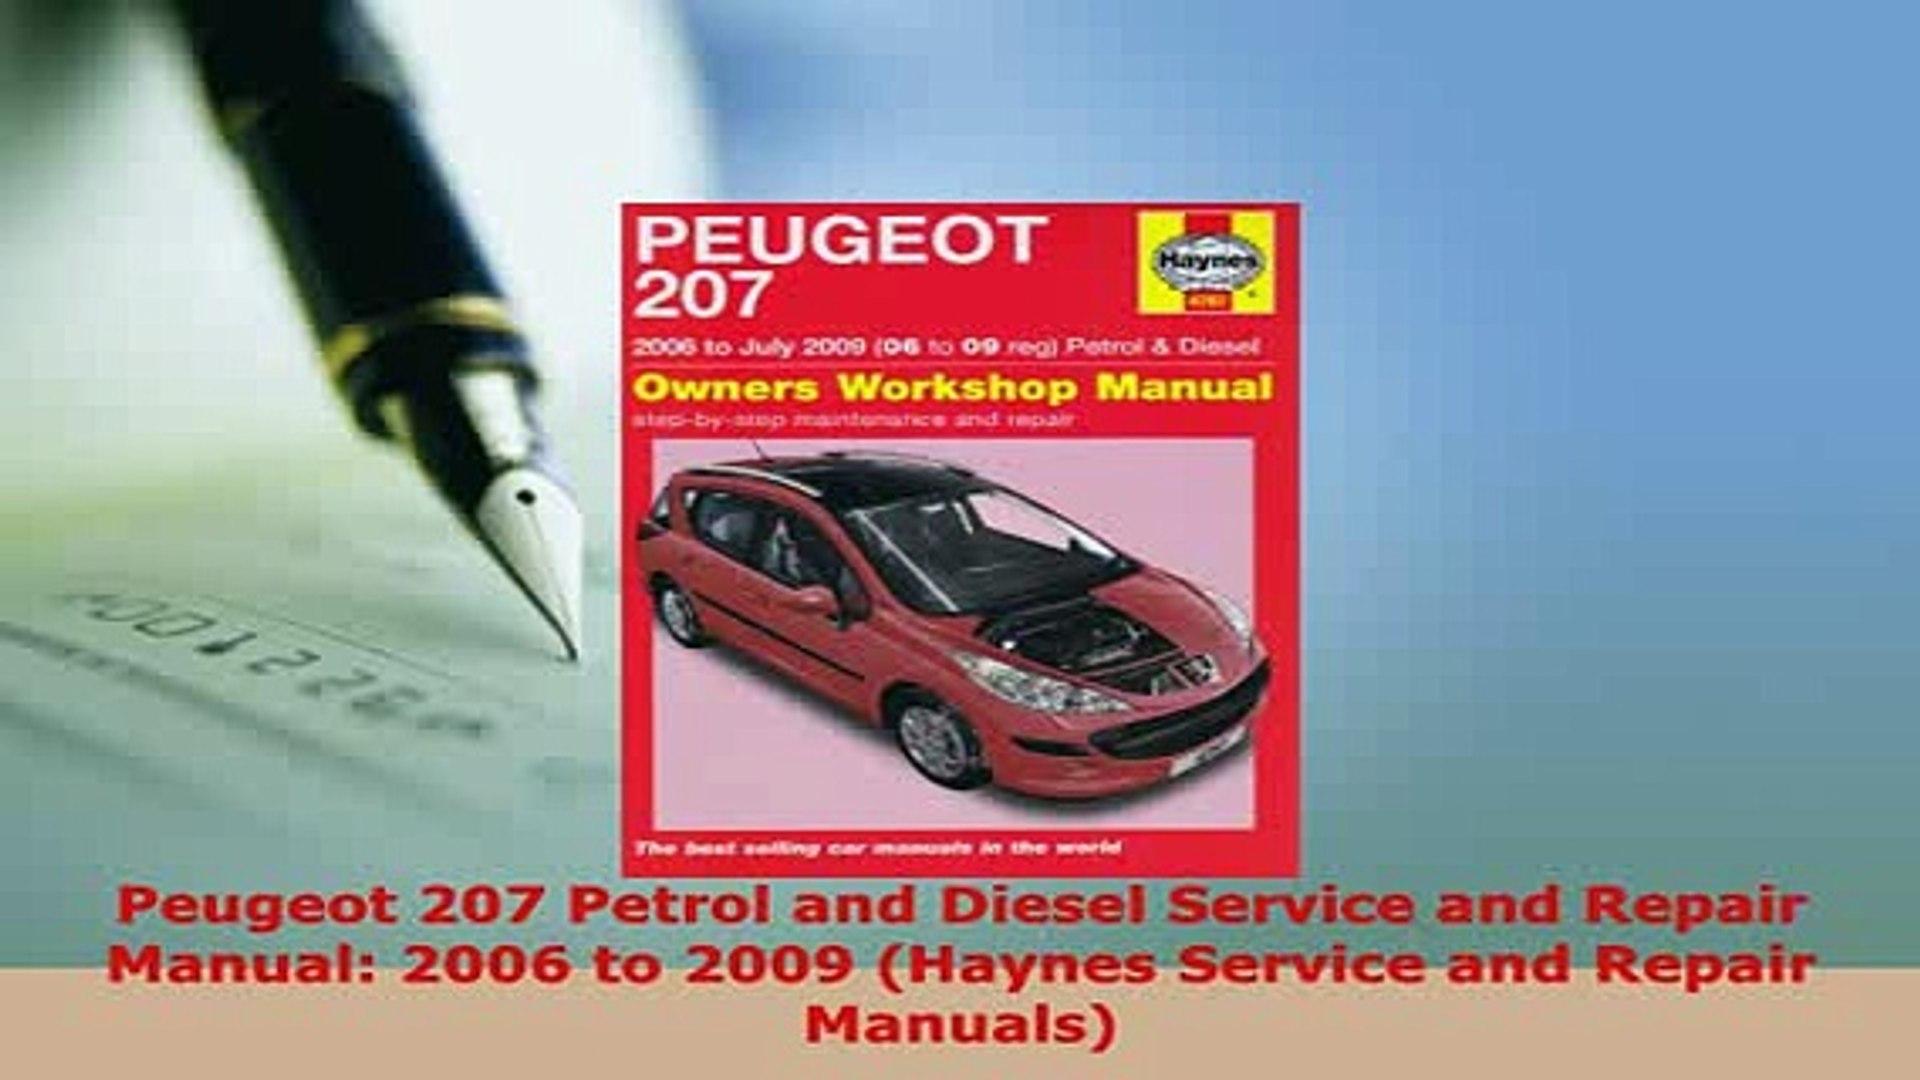 Download Peugeot 207 Petrol and Diesel Service and Repair Manual 2006 to  2009 Haynes Service and Ebook